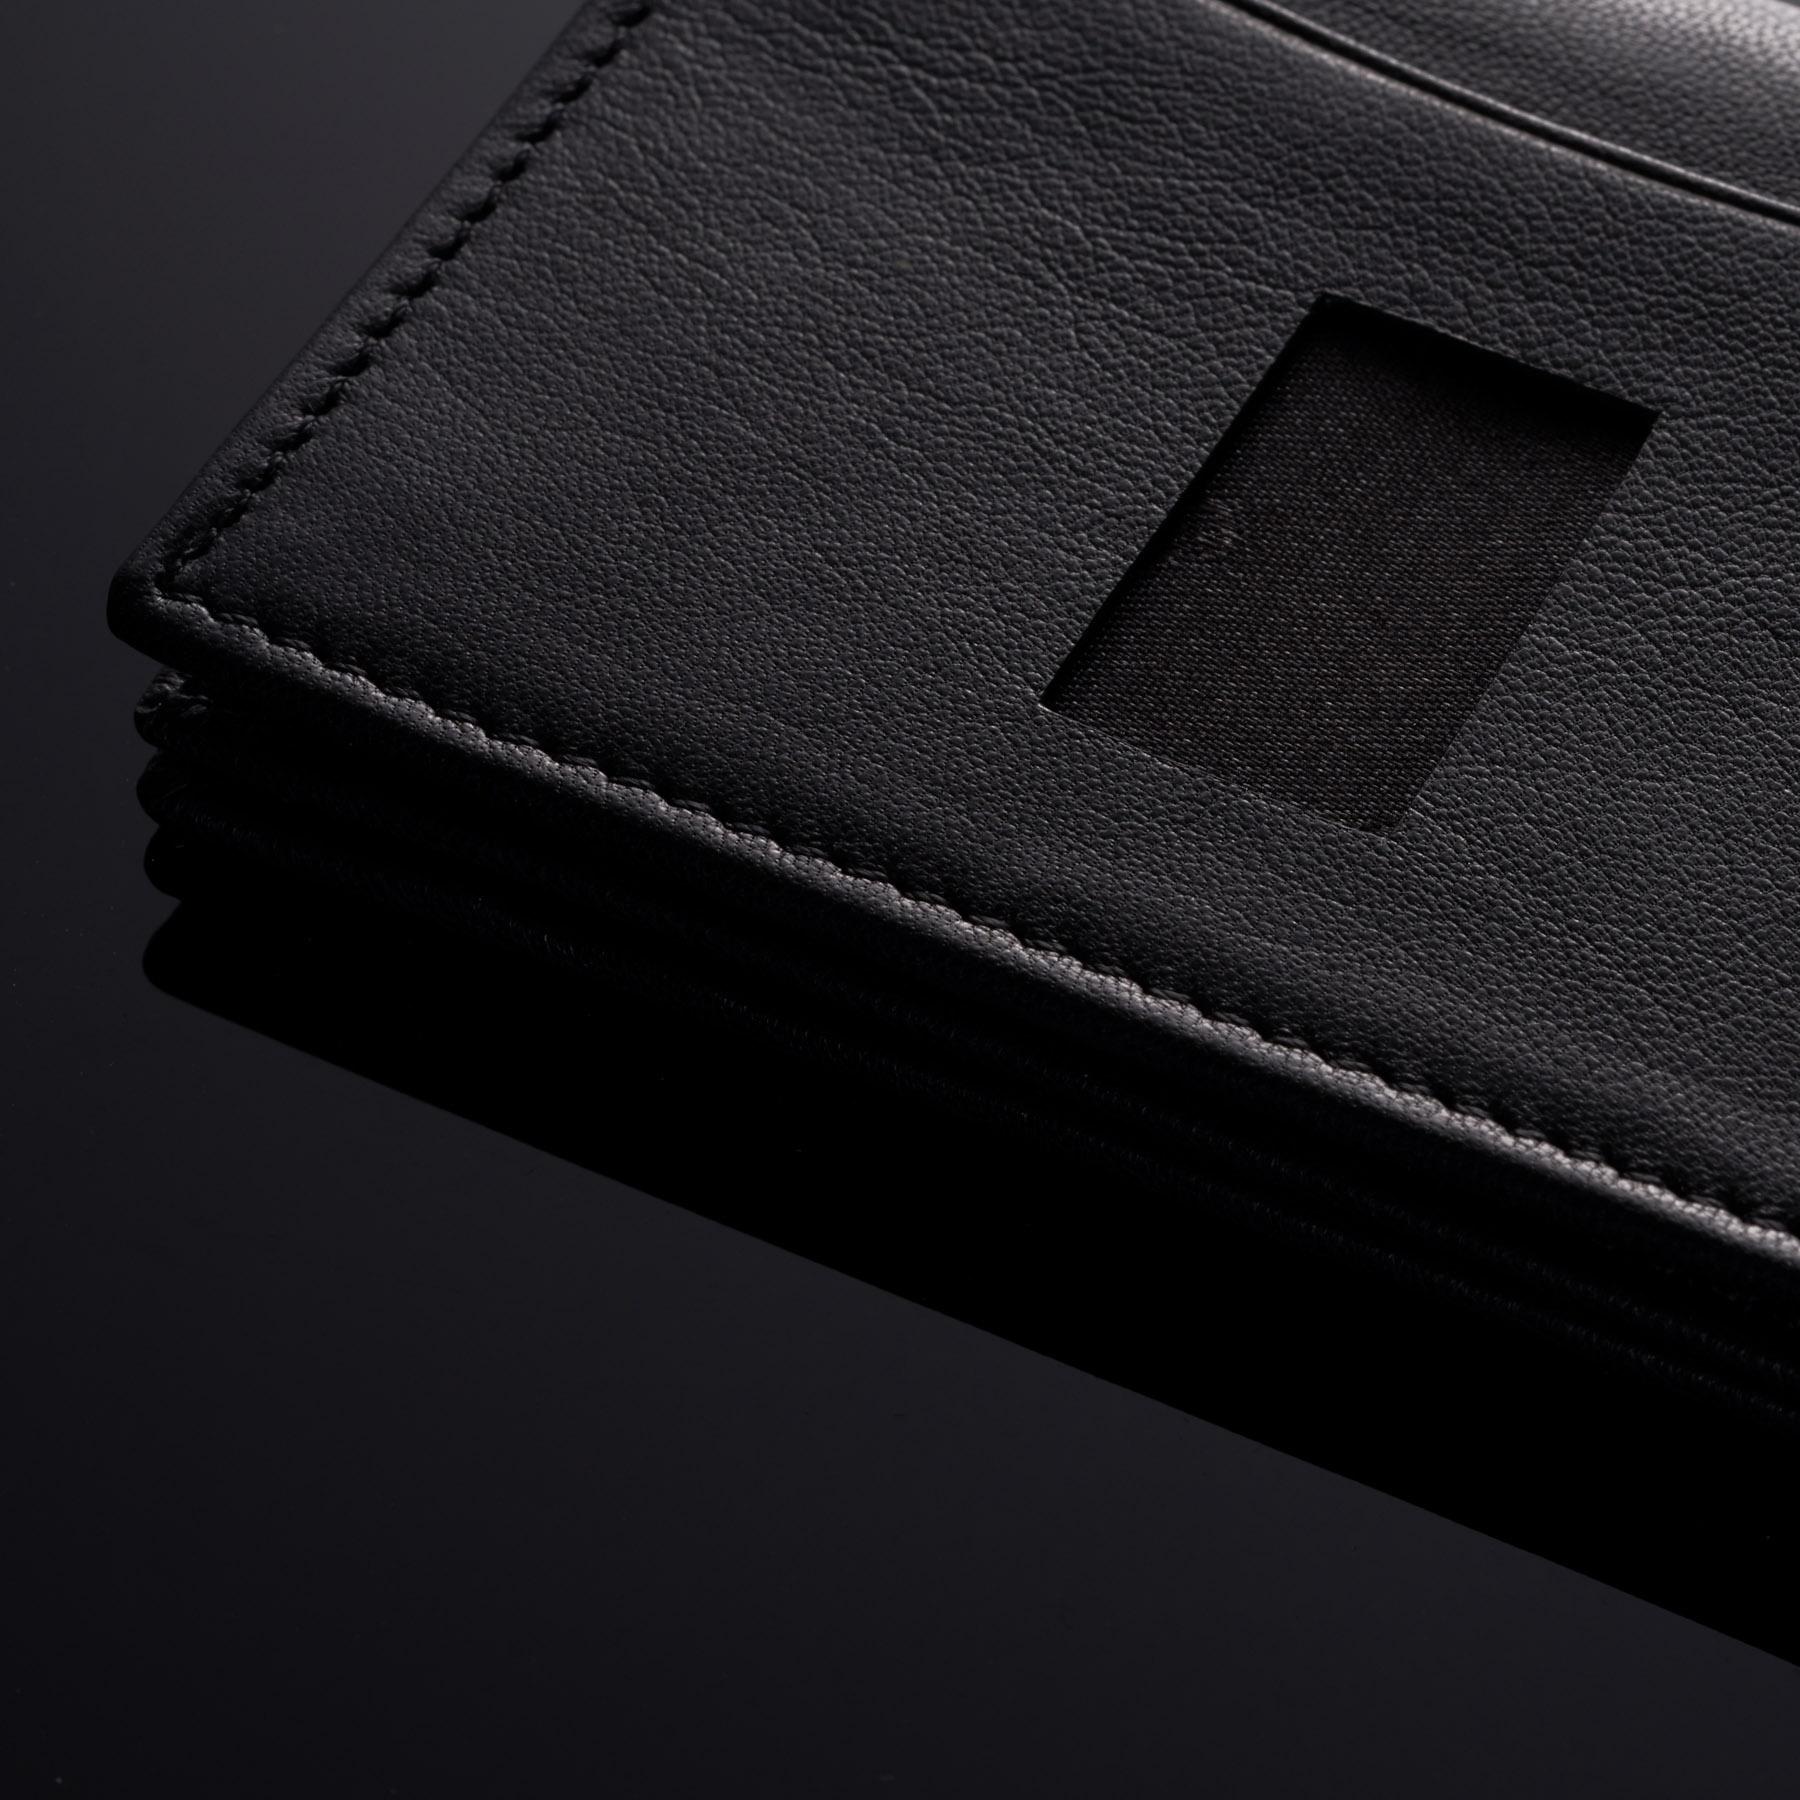 Alpine-Swiss-RFID-Leather-Business-Card-Wallet-Minimalist-ID-Window-Card-Holder thumbnail 17